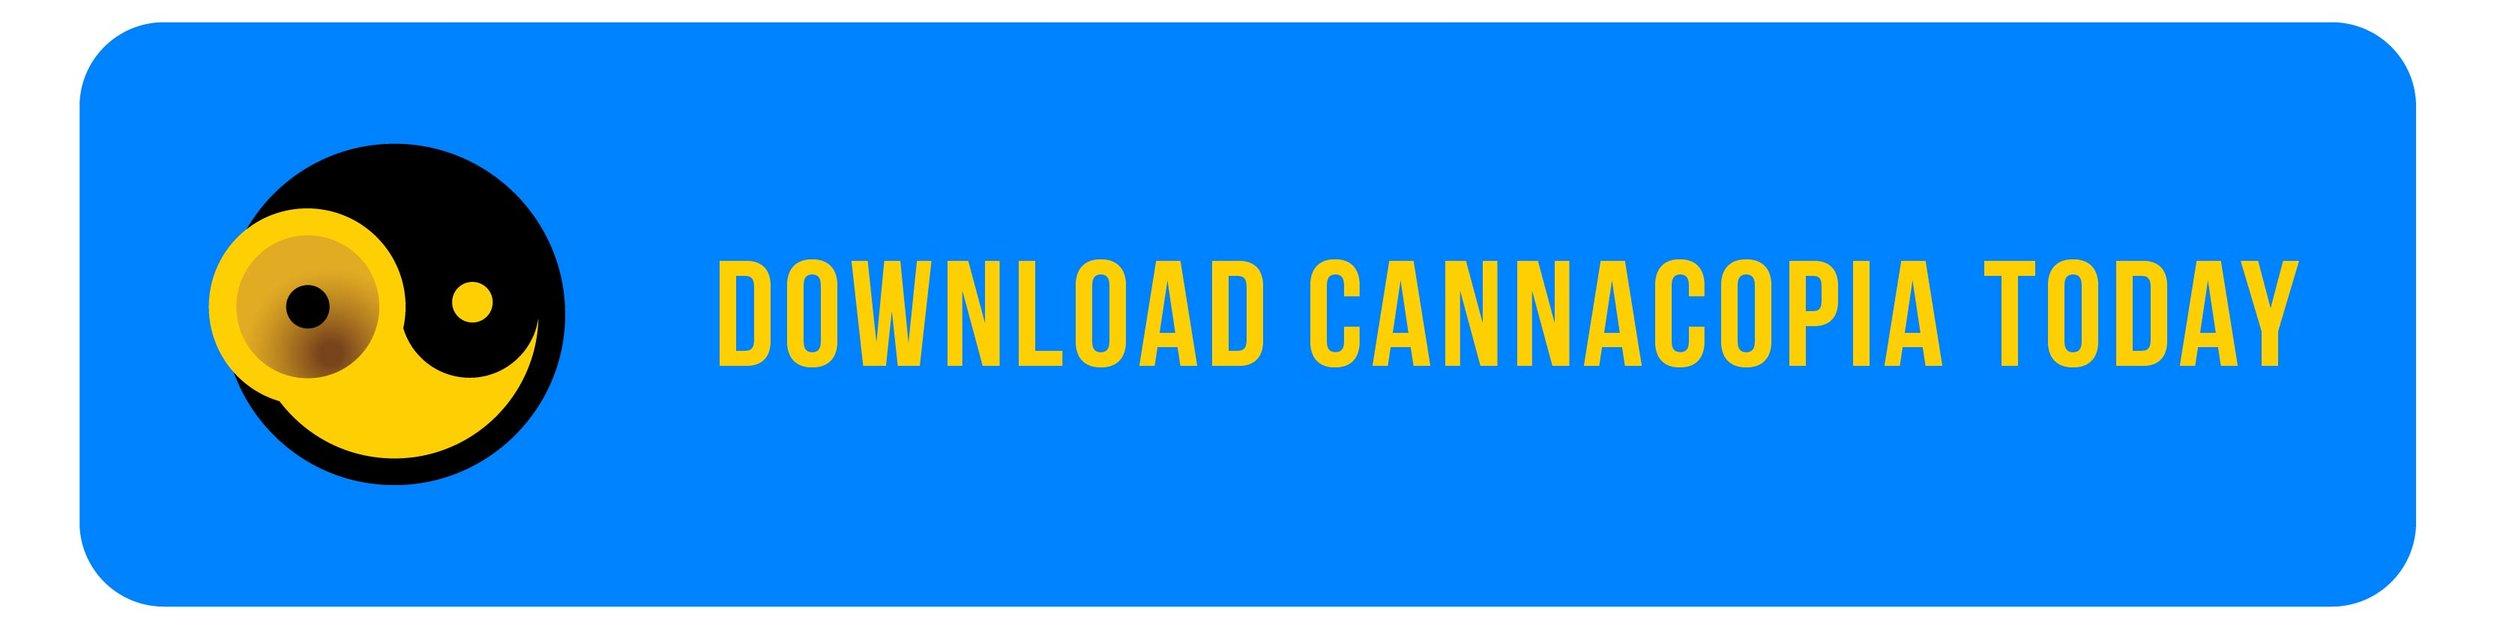 download cannacopia